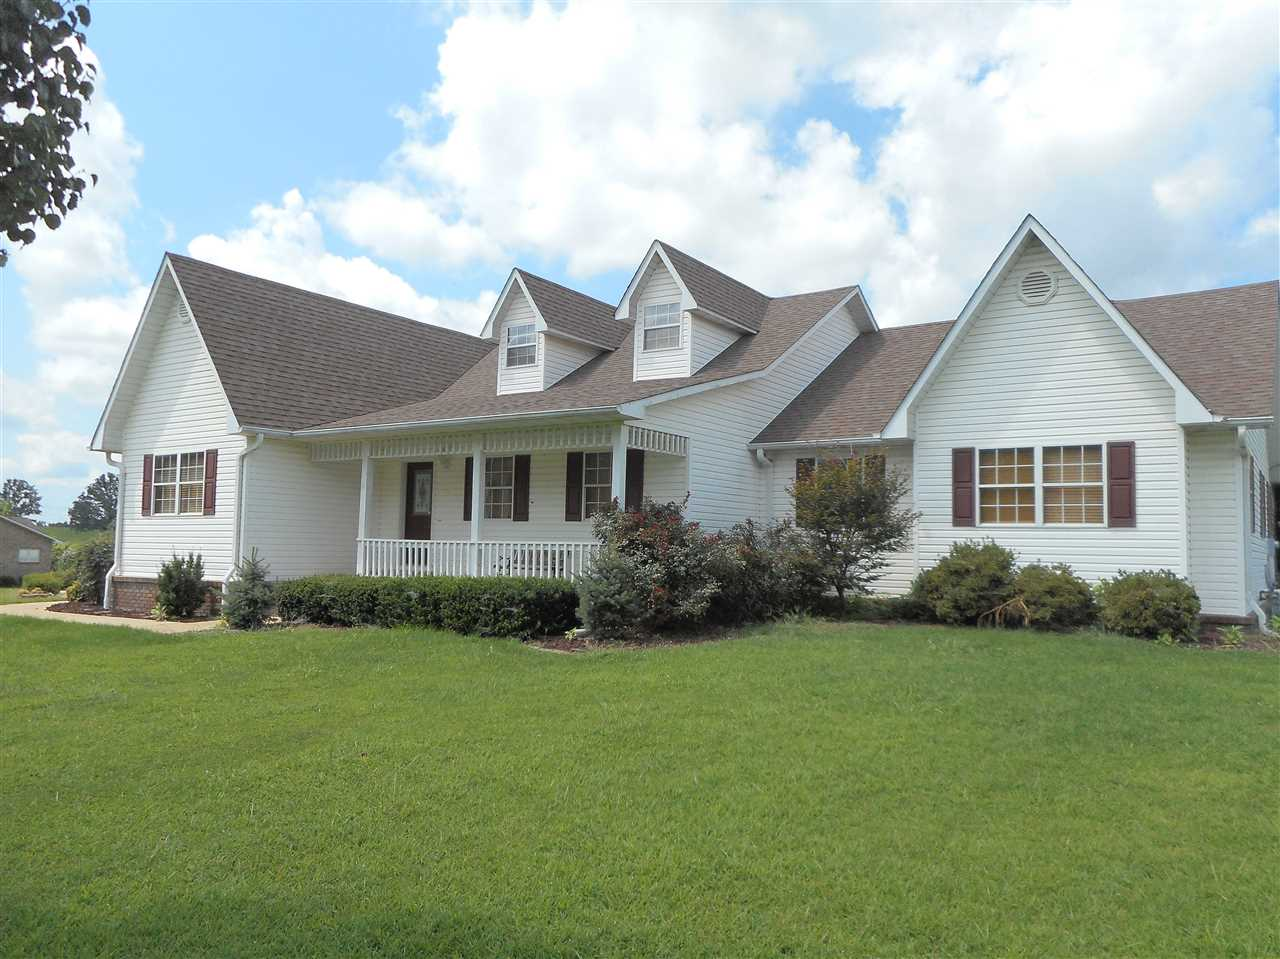 Real Estate for Sale, ListingId: 34954213, Doniphan,MO63935